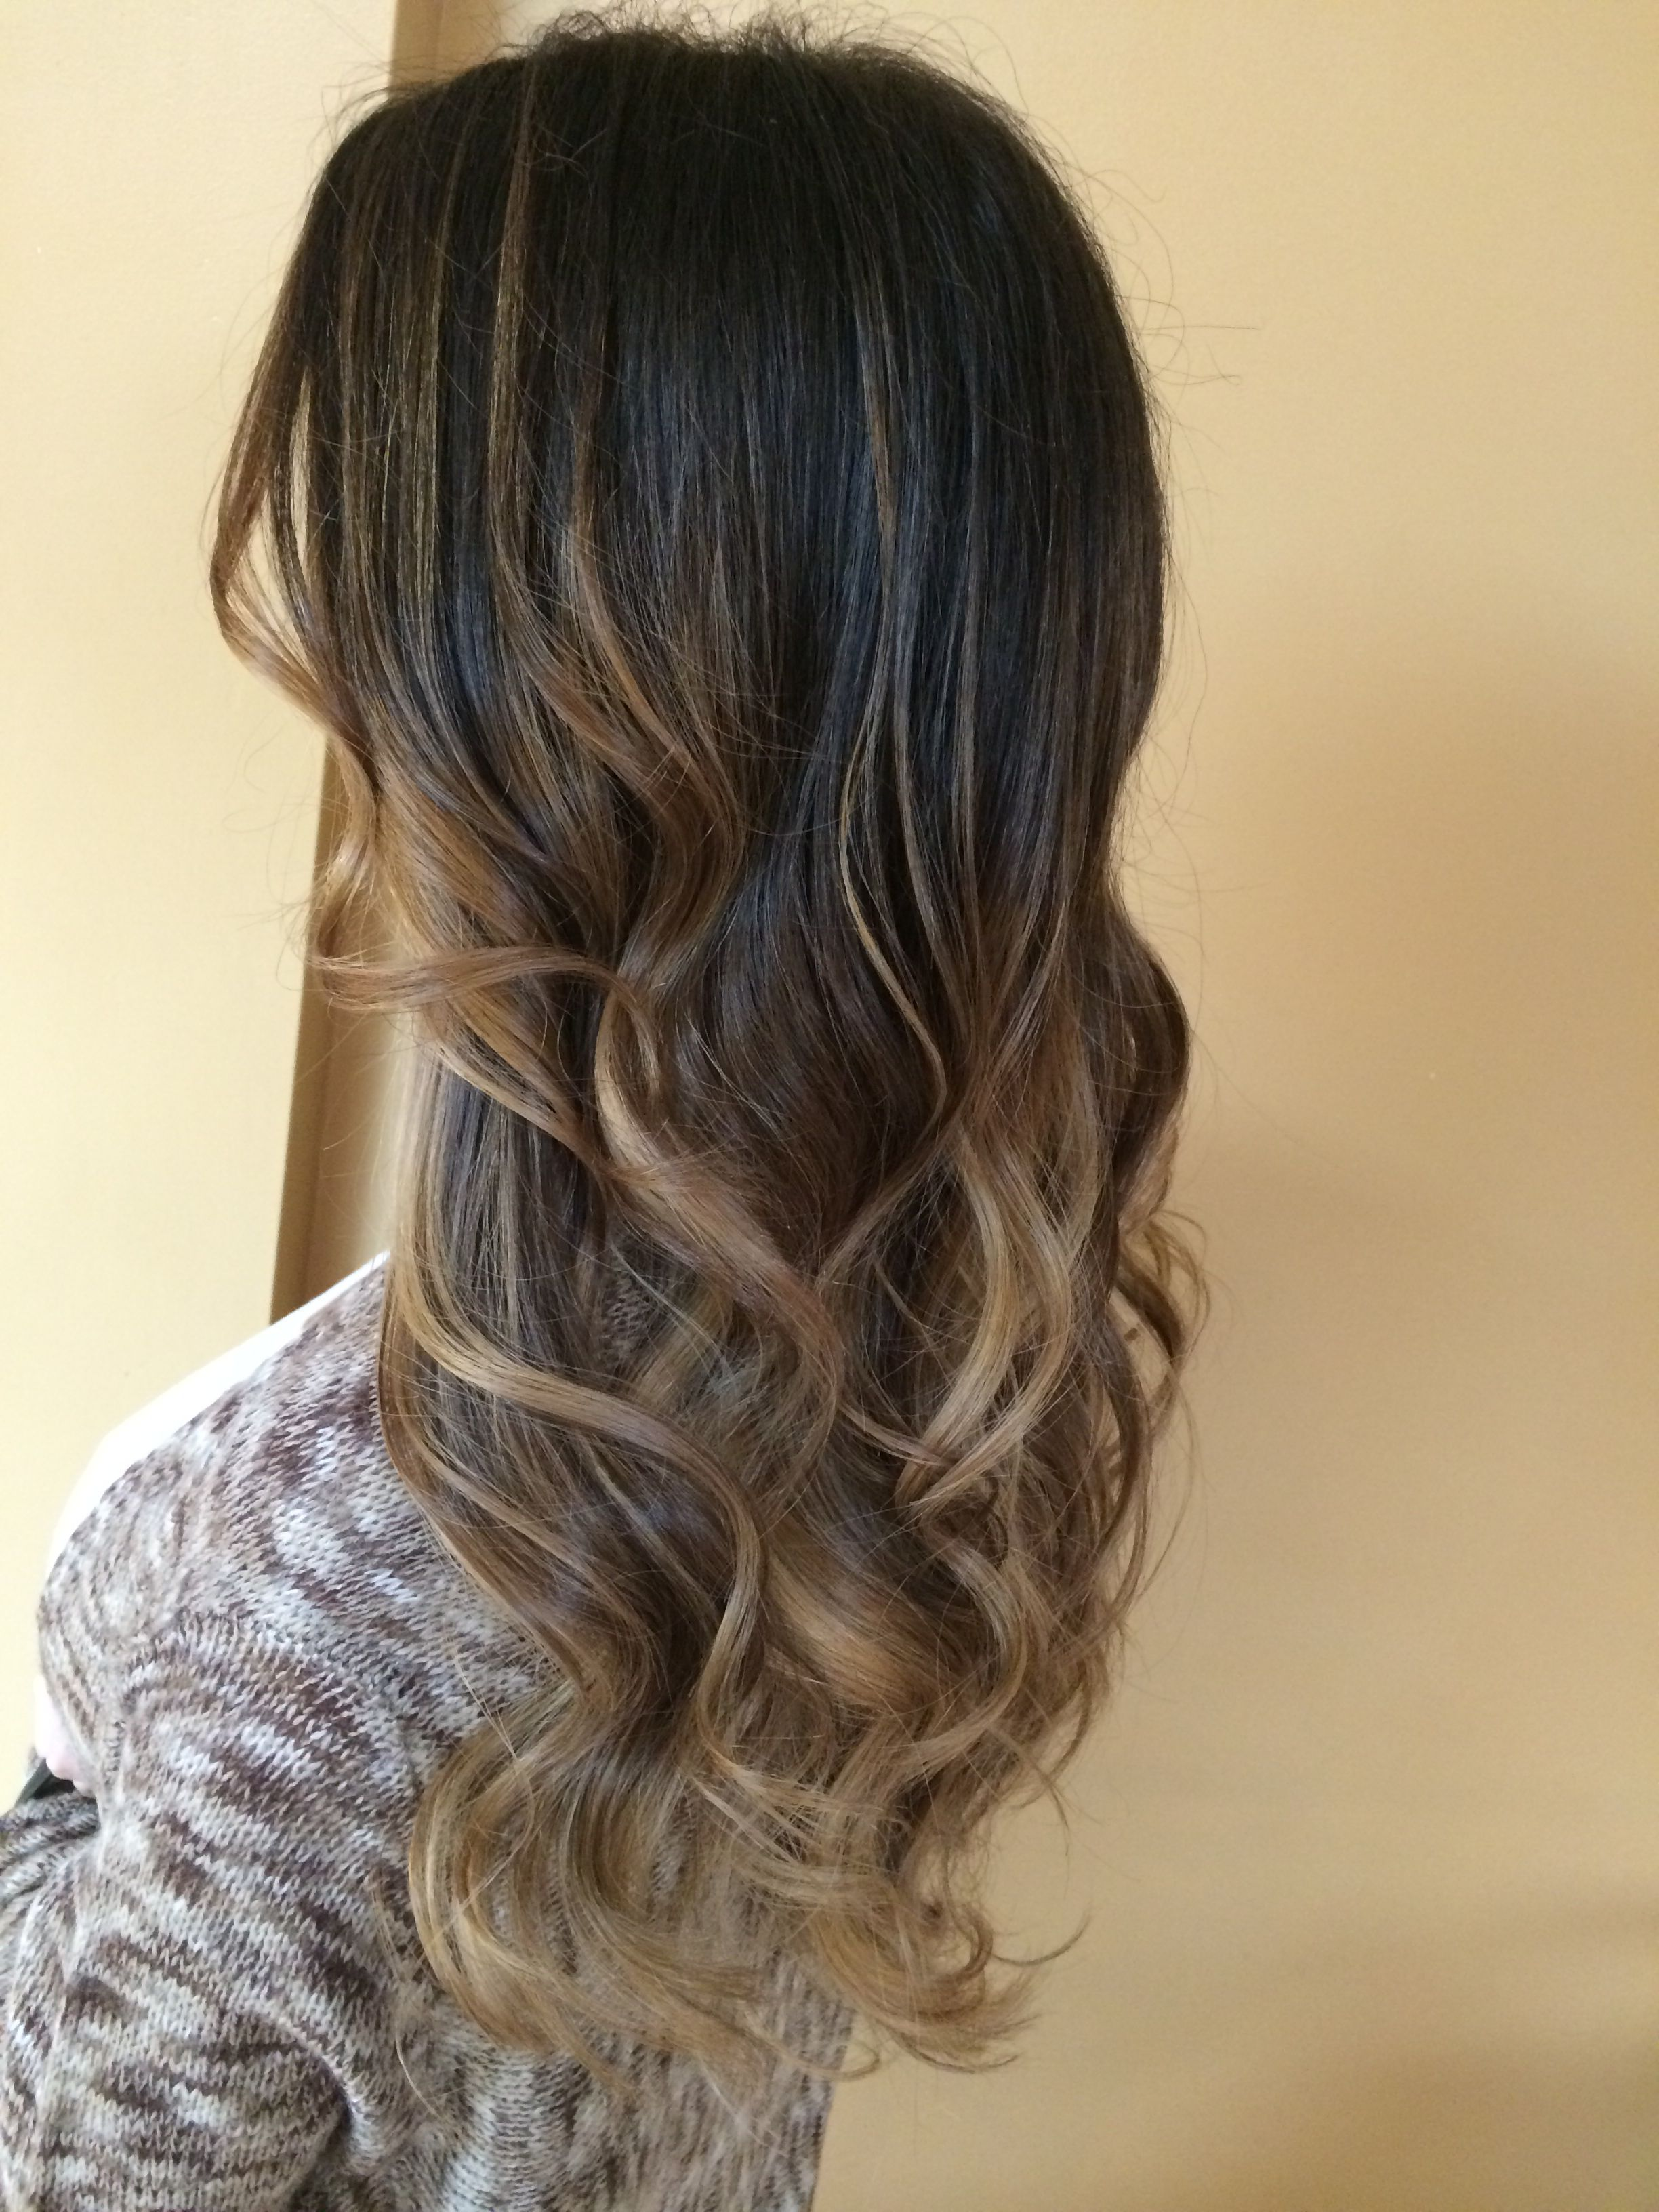 Dark Brown Fading Into A Beige Blonde Balayage Glaze Long Layered Haircut Blowdry Curls Balayage Hair Blonde Long Balayage Hair Ash Balayage Hair Grey